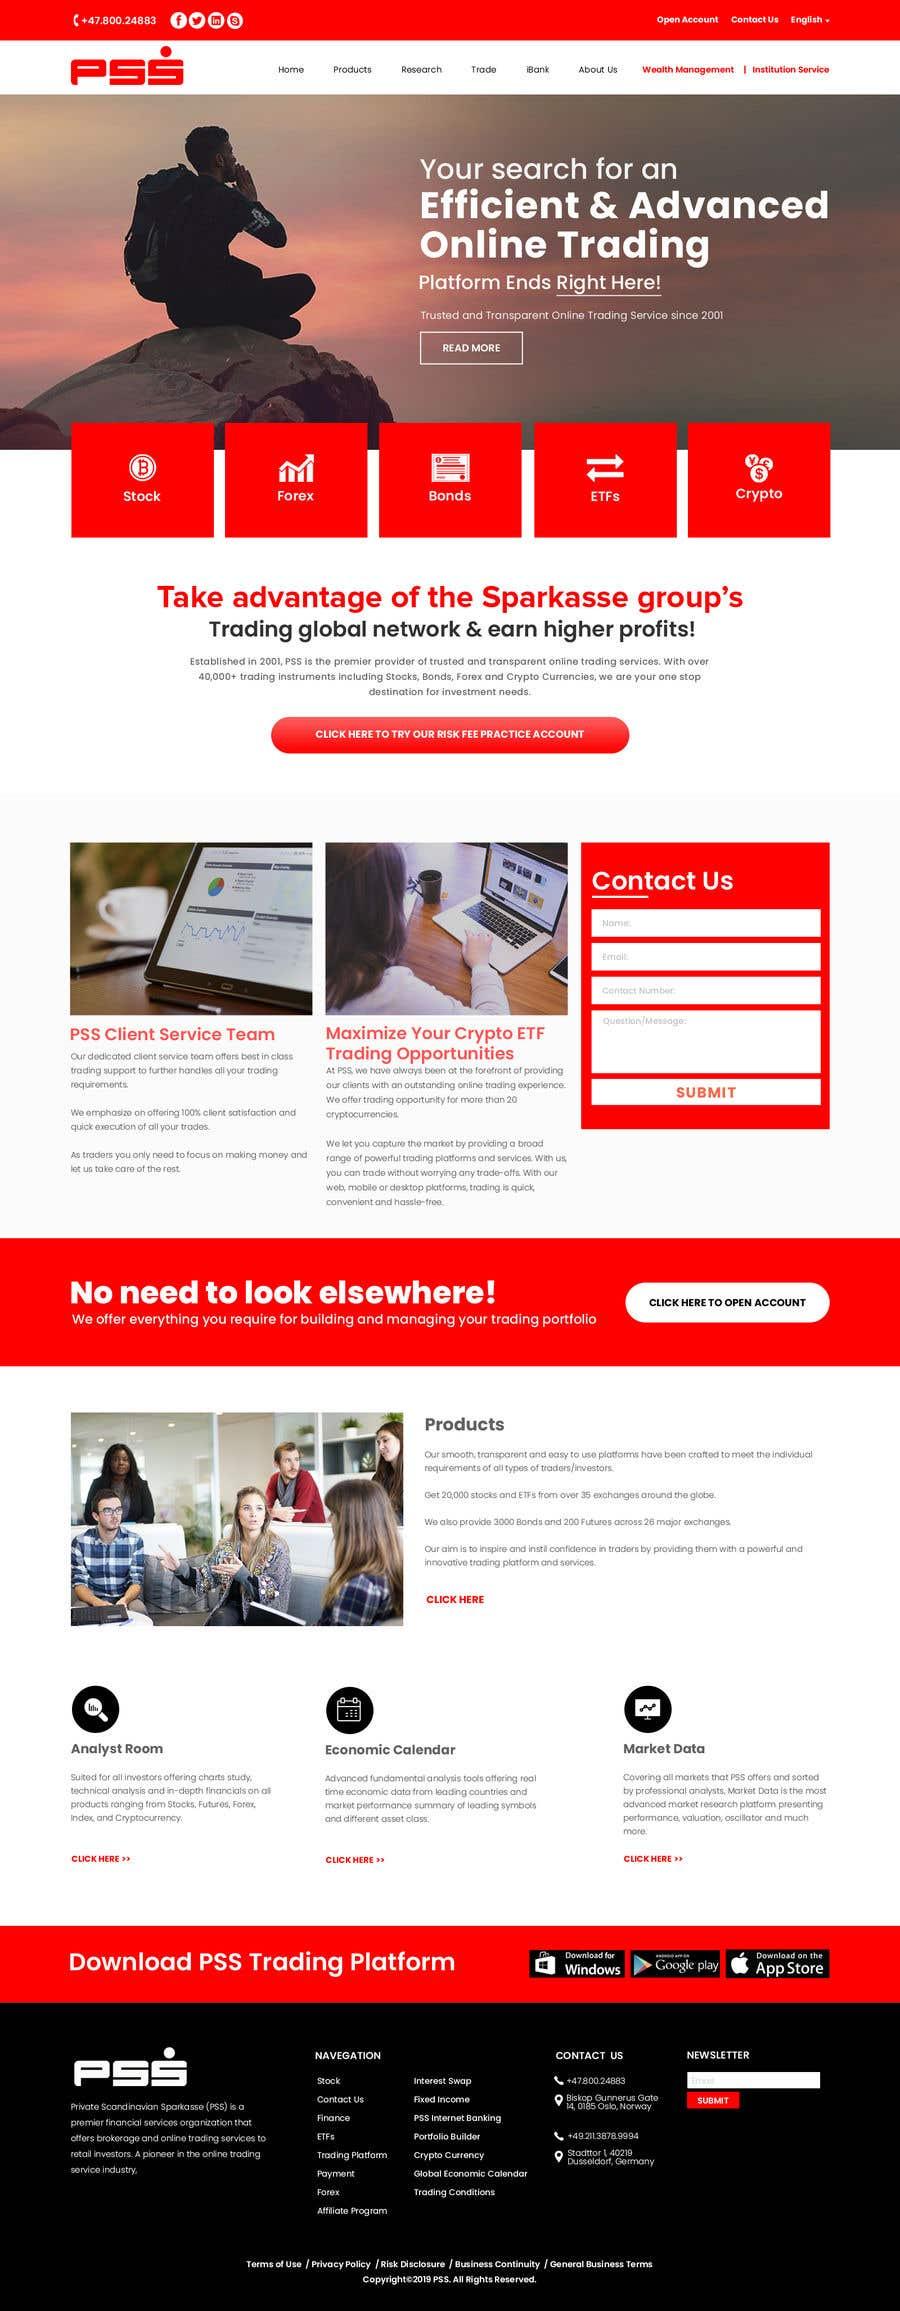 "Intrarea #15 pentru concursul ""Home page design for existing site"""